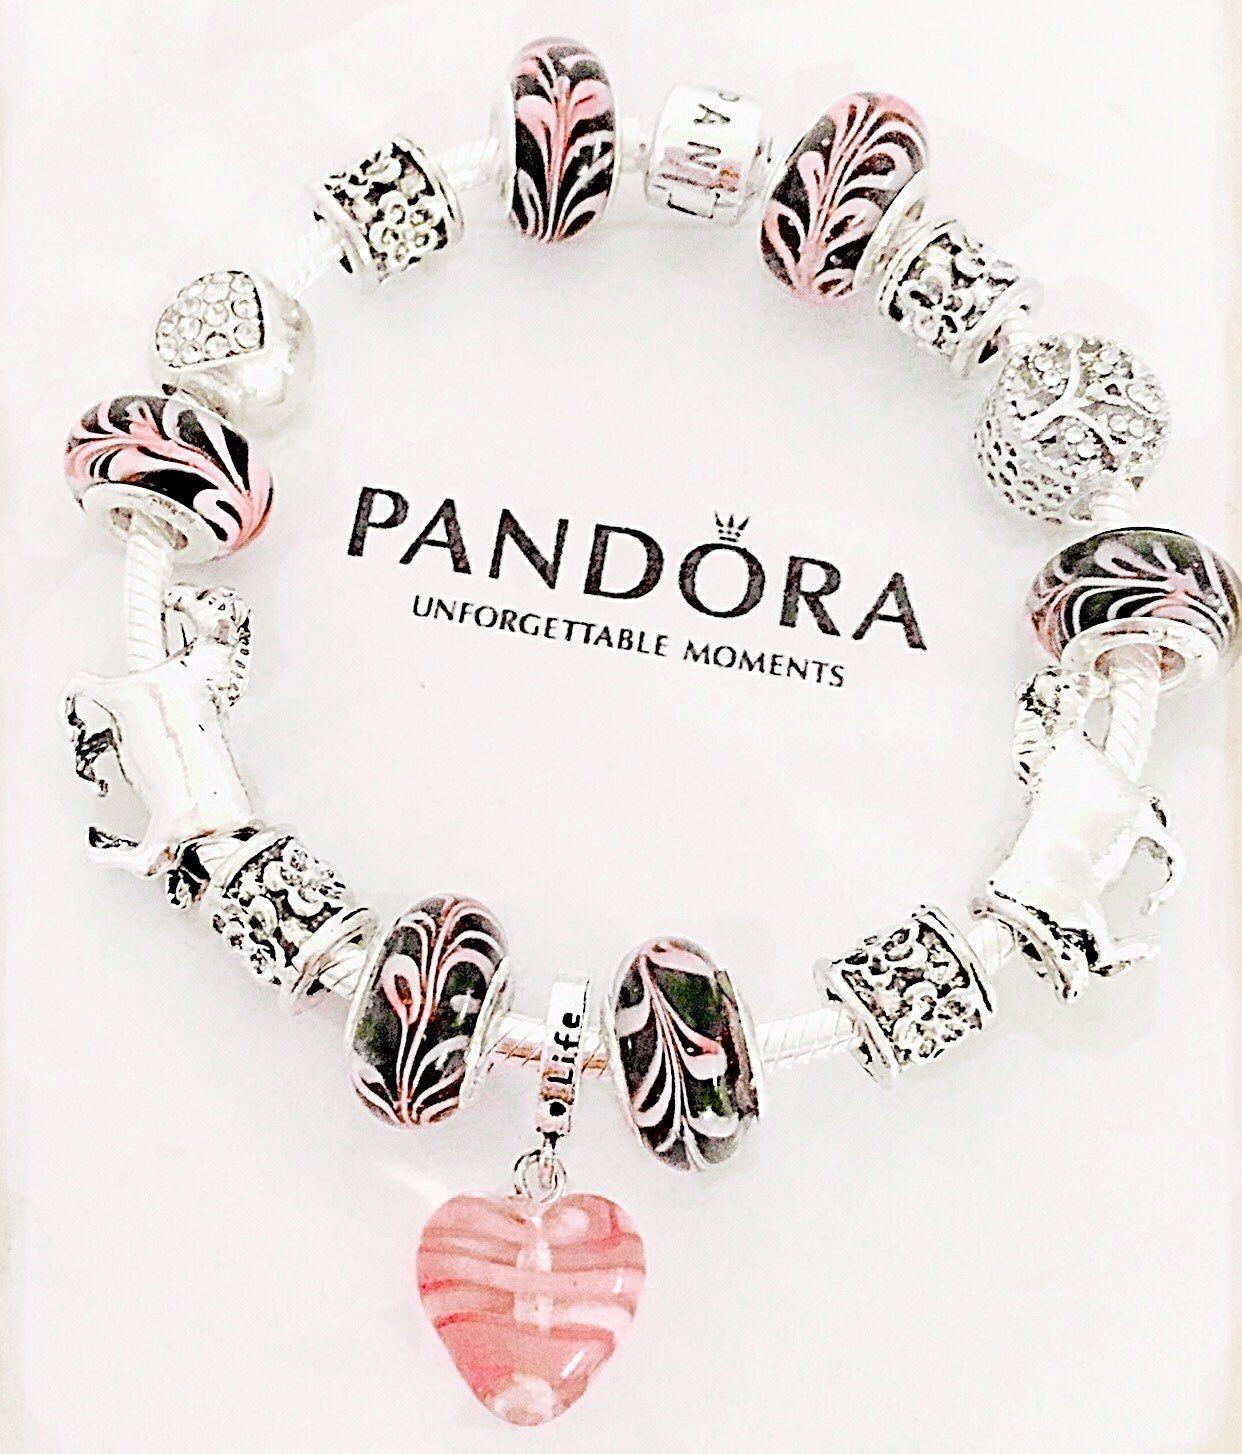 Iconic Pandora Sterling Sliver Bracelet With Barrel Clasp Stamped 925 Ale Inside The Clasp Featuring 2 Beautif Pandora Jewelry Box Pandora Bracelets Jewelry